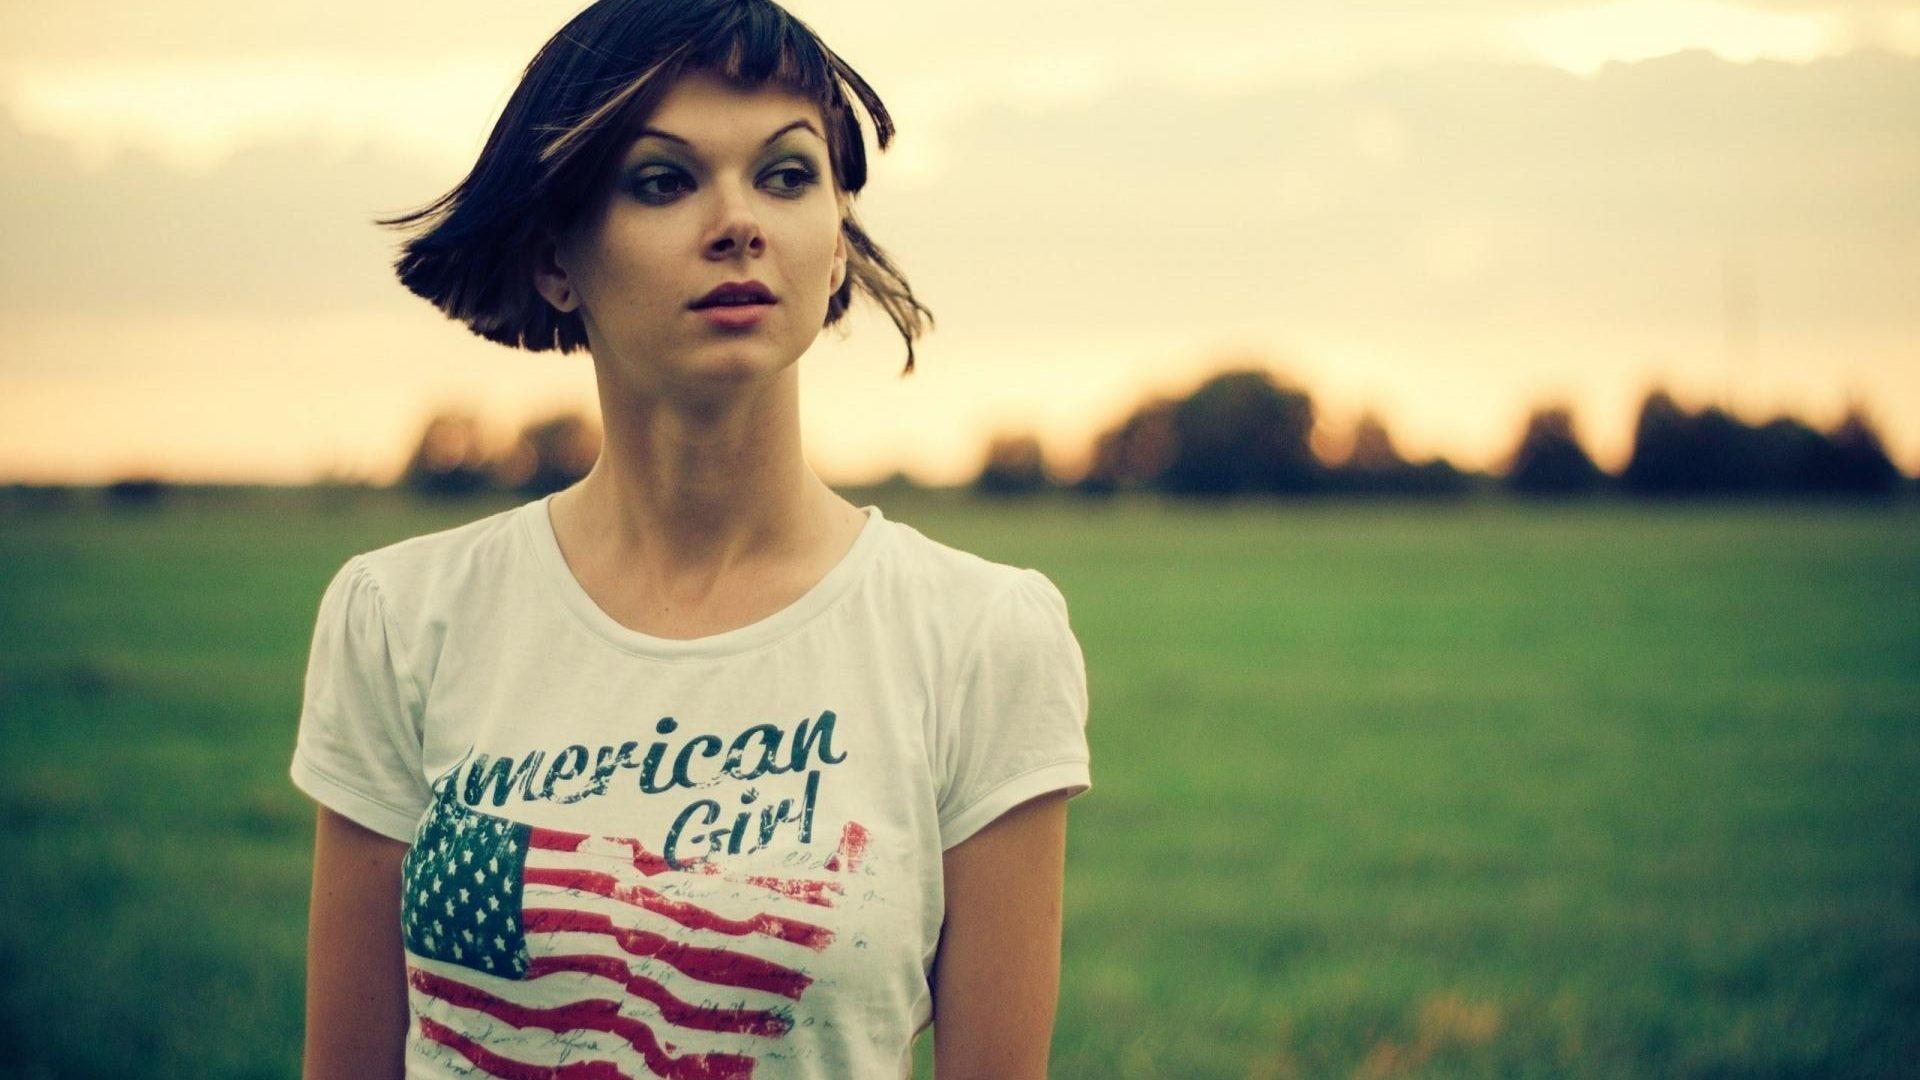 american girl wallpapers hd